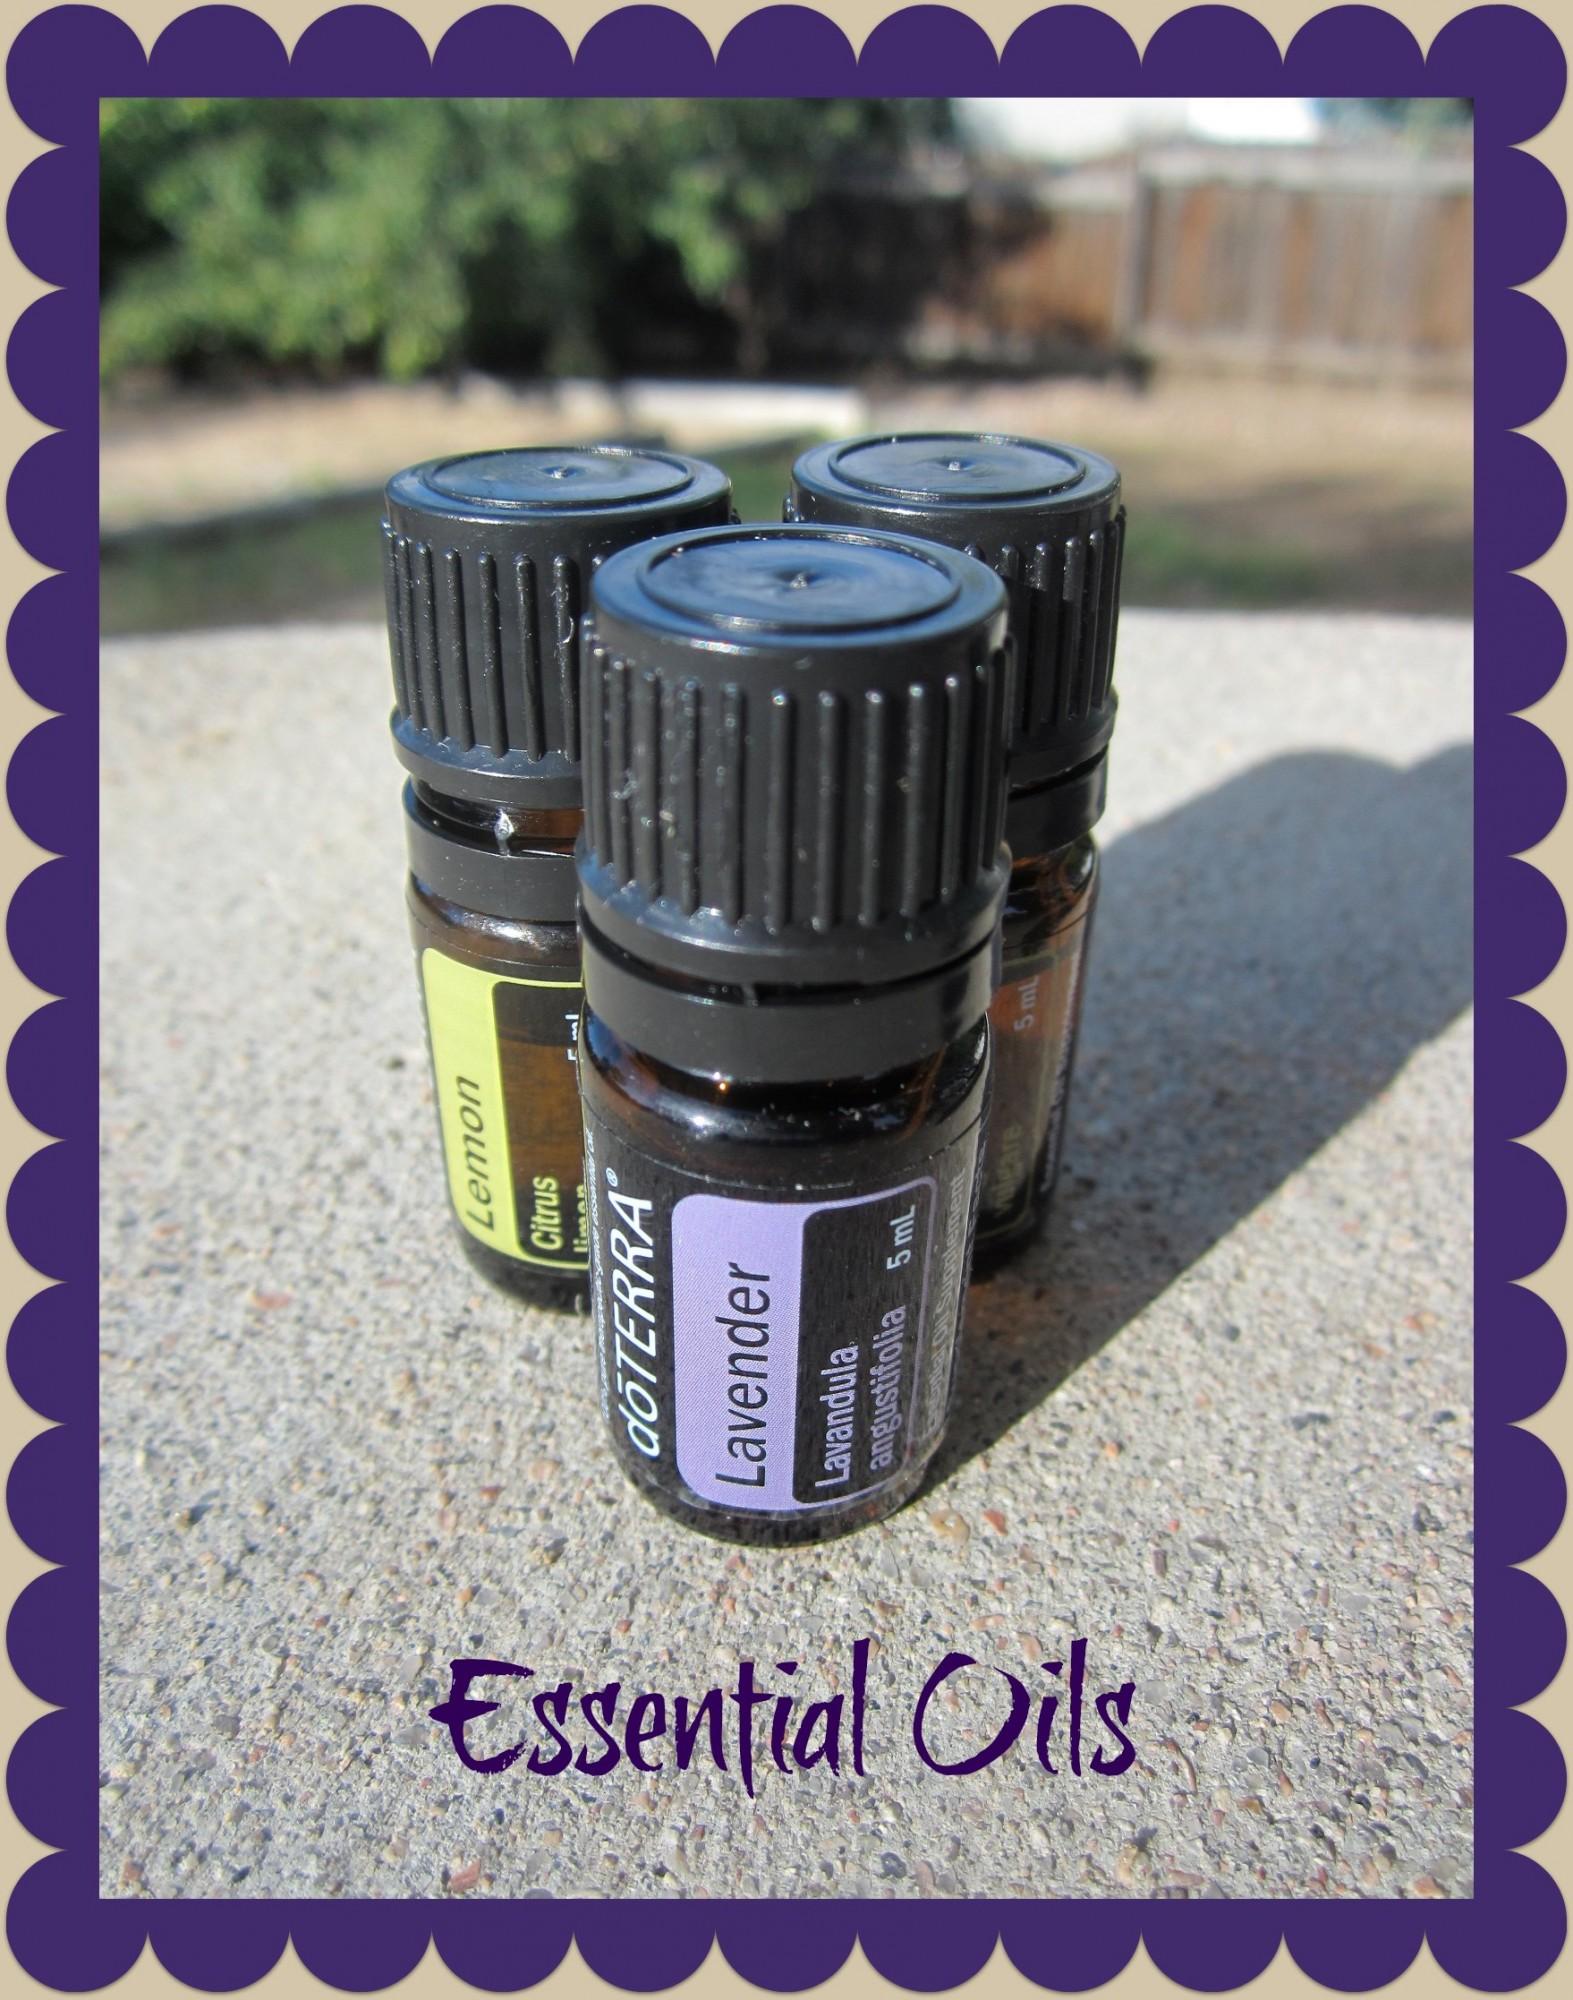 Essential Oils - www.mamashappyhive.com.jpg